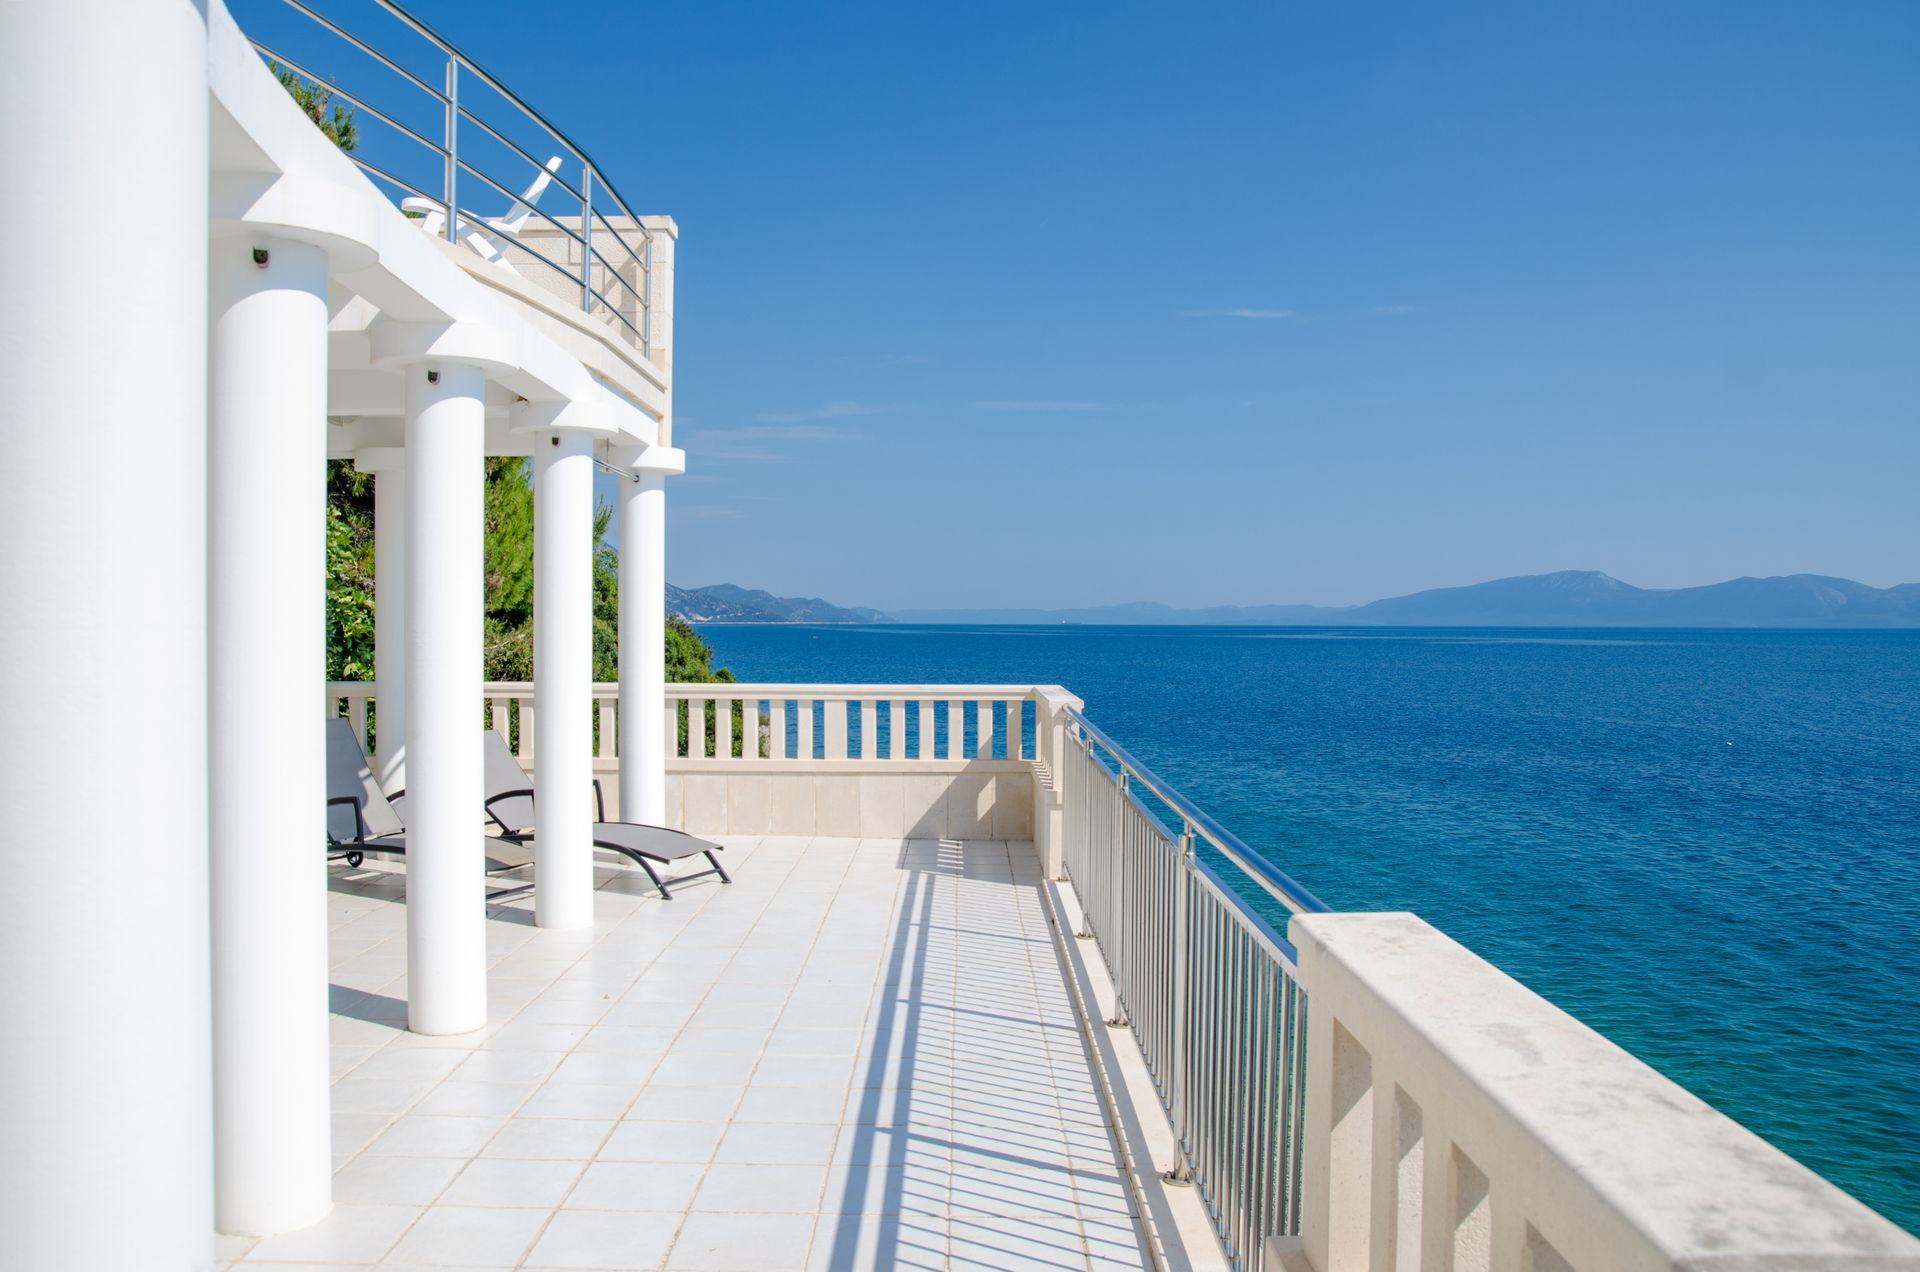 Beachfront Villa Shades of Summer